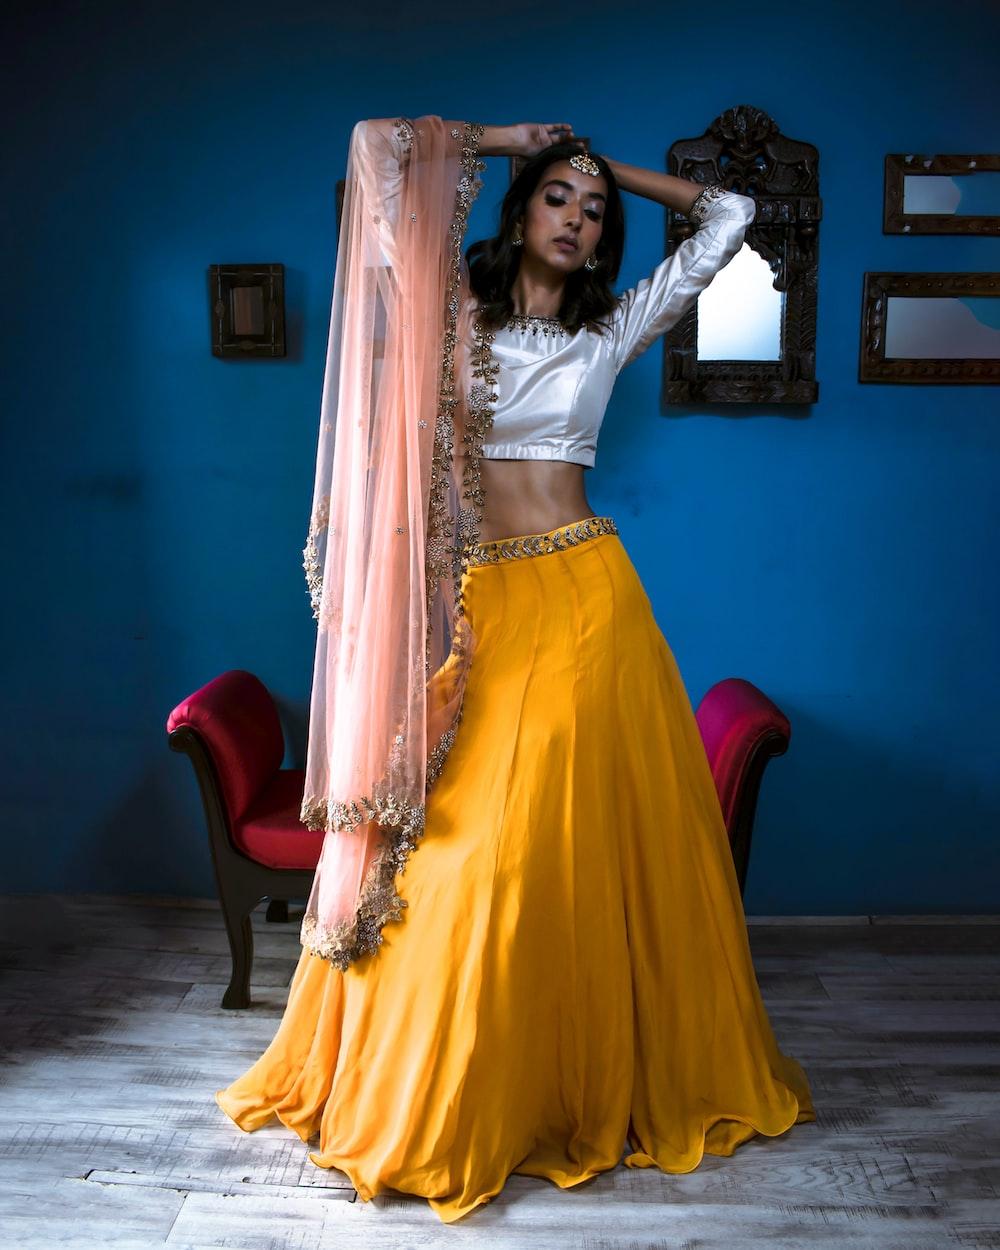 Woman Wearing White Crop Top And Yellow Long Skirt Photo Free Image On Unsplash Shop designer croptop and lehenga. woman wearing white crop top and yellow